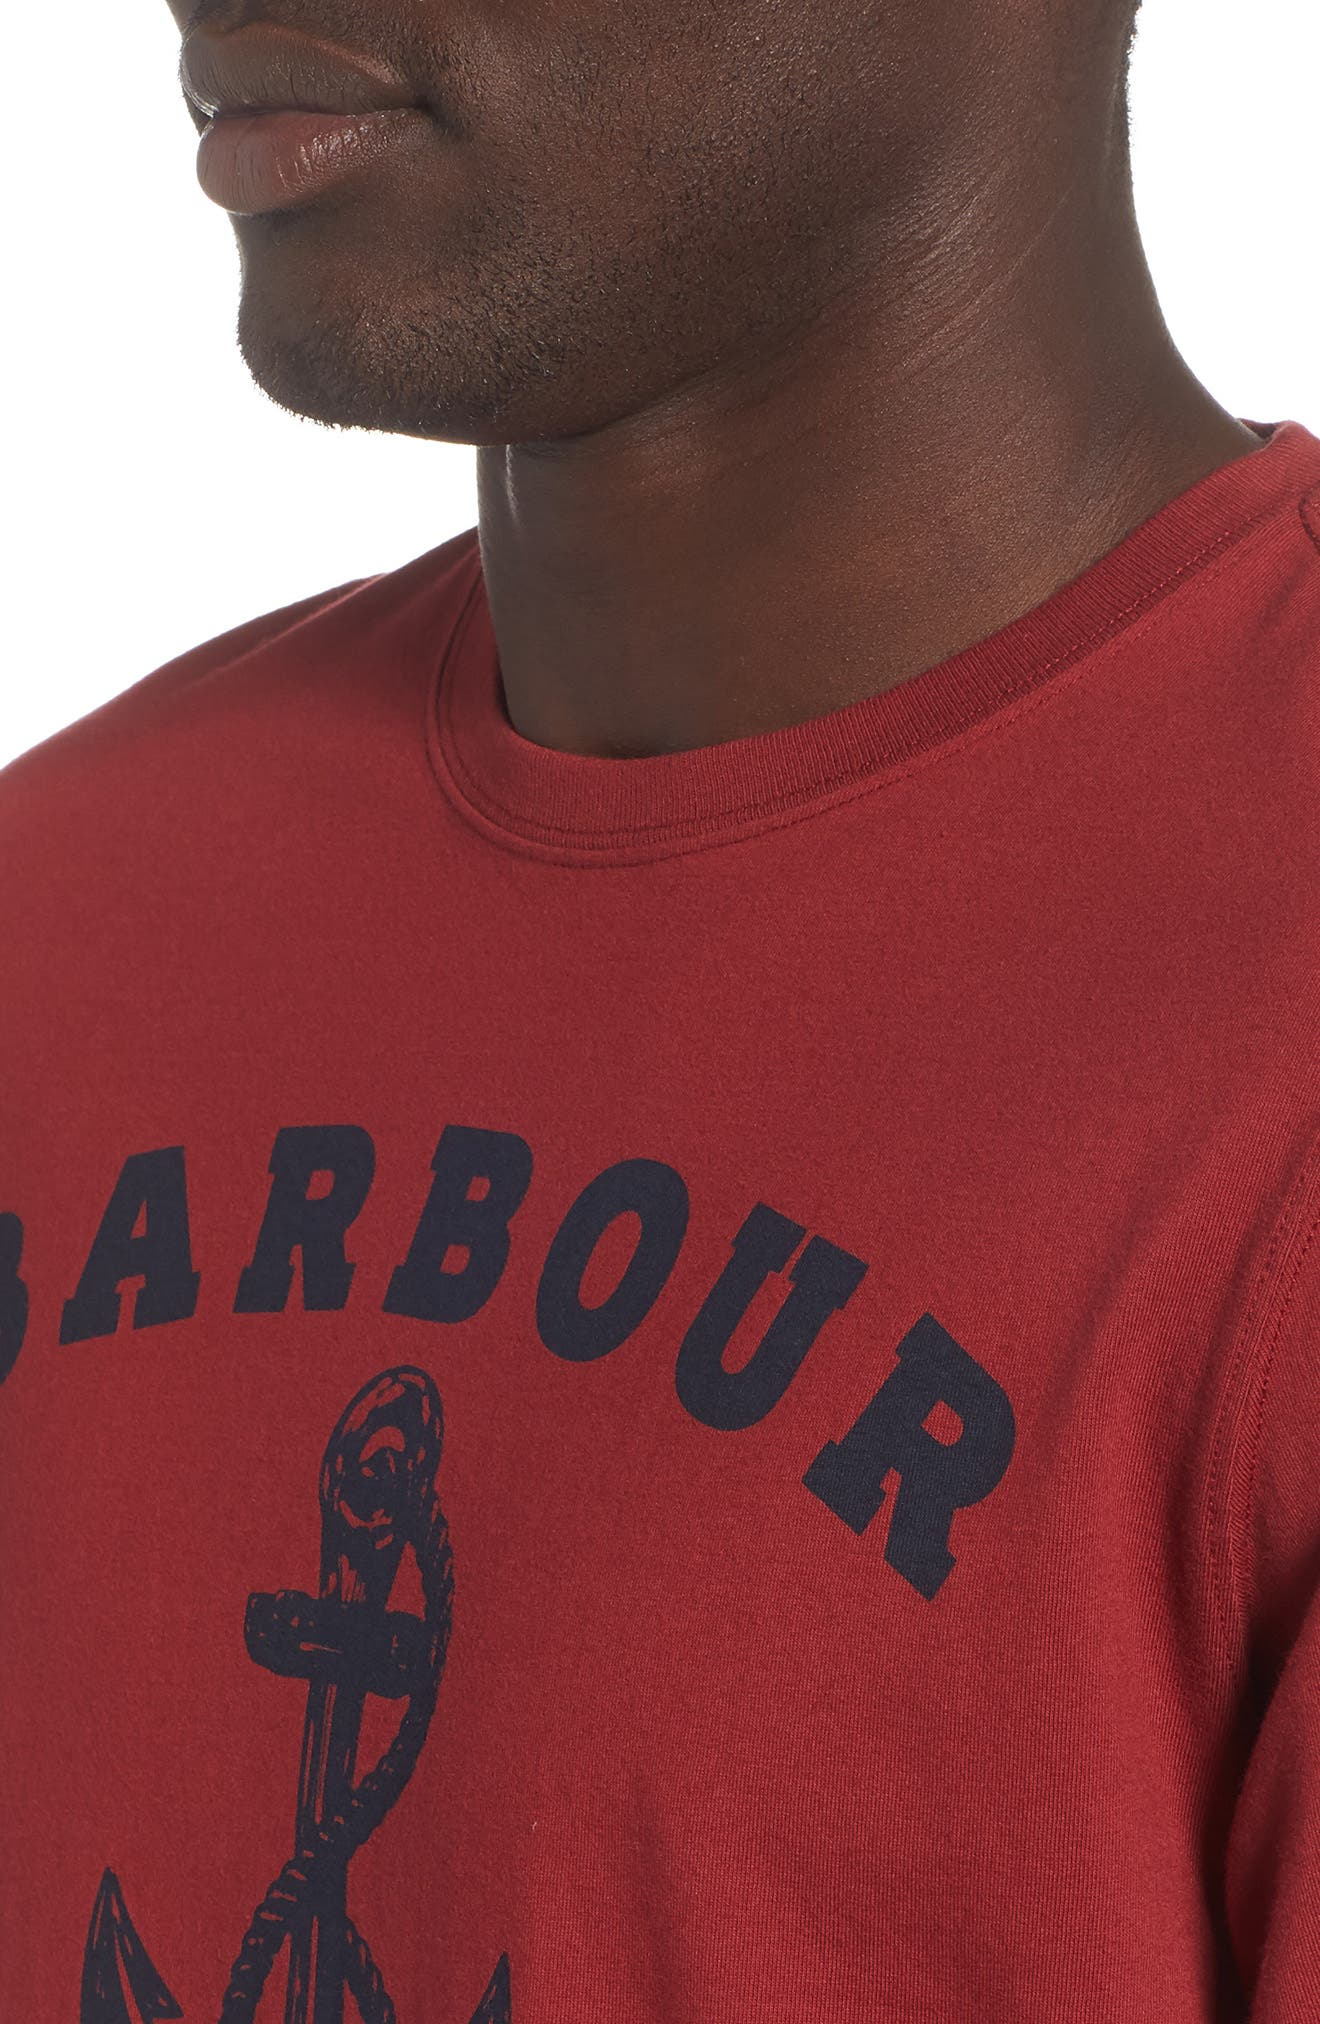 Anchor Graphic T-Shirt,                             Alternate thumbnail 4, color,                             Biking Red